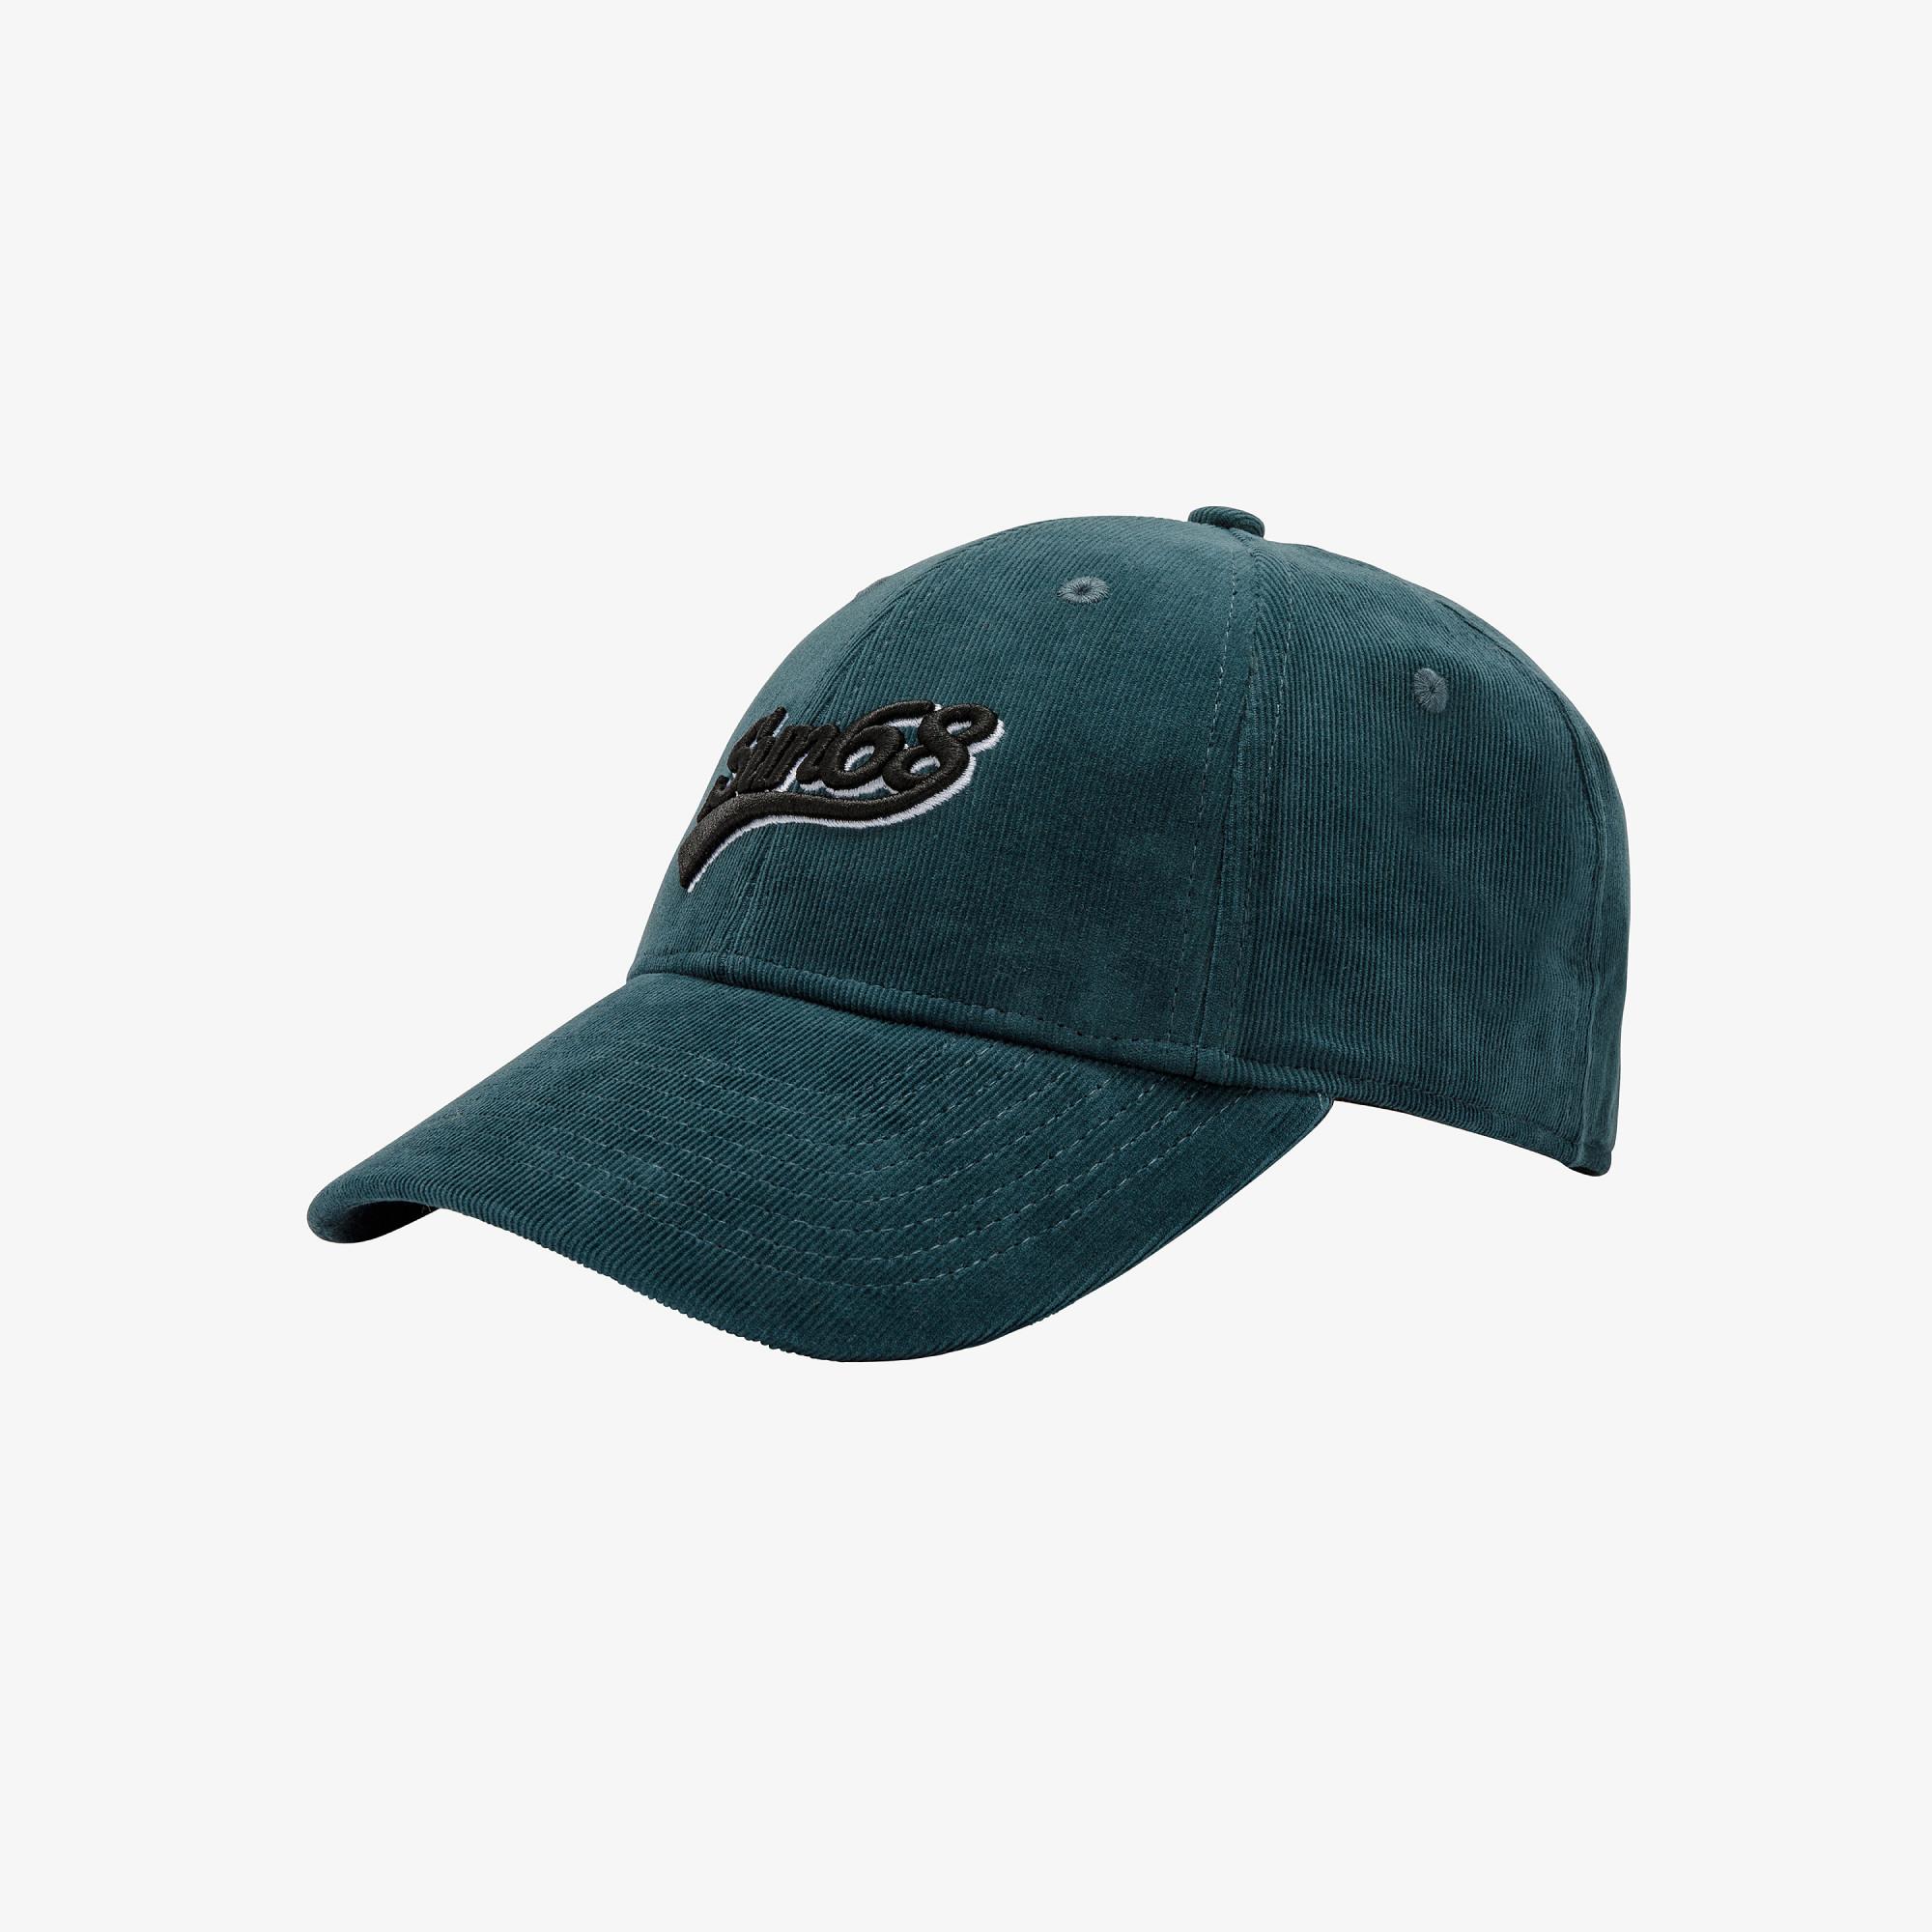 BASEBALL CAP CORDUROY GREEN EMERALD